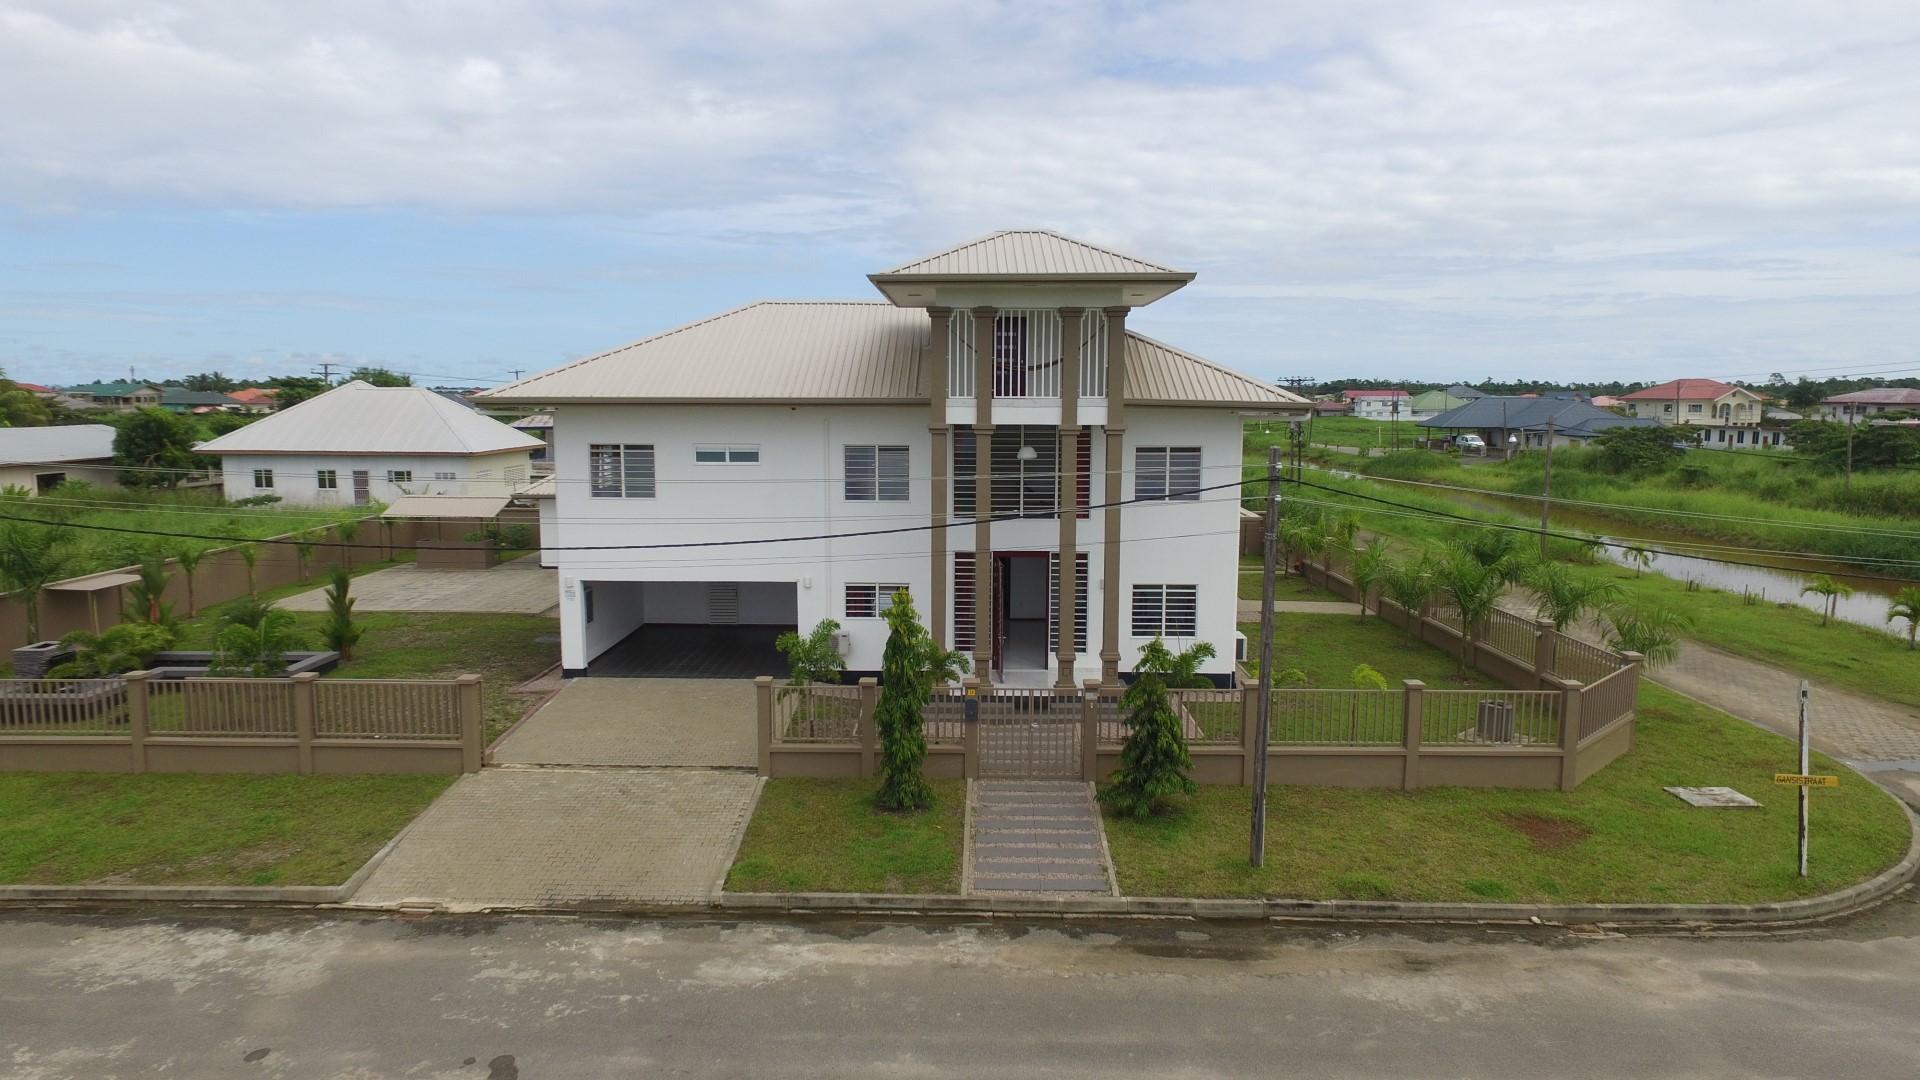 Gansistraat-Morgenstond-Paramaribo-Suriname-Terzol-Vastgoed-s03